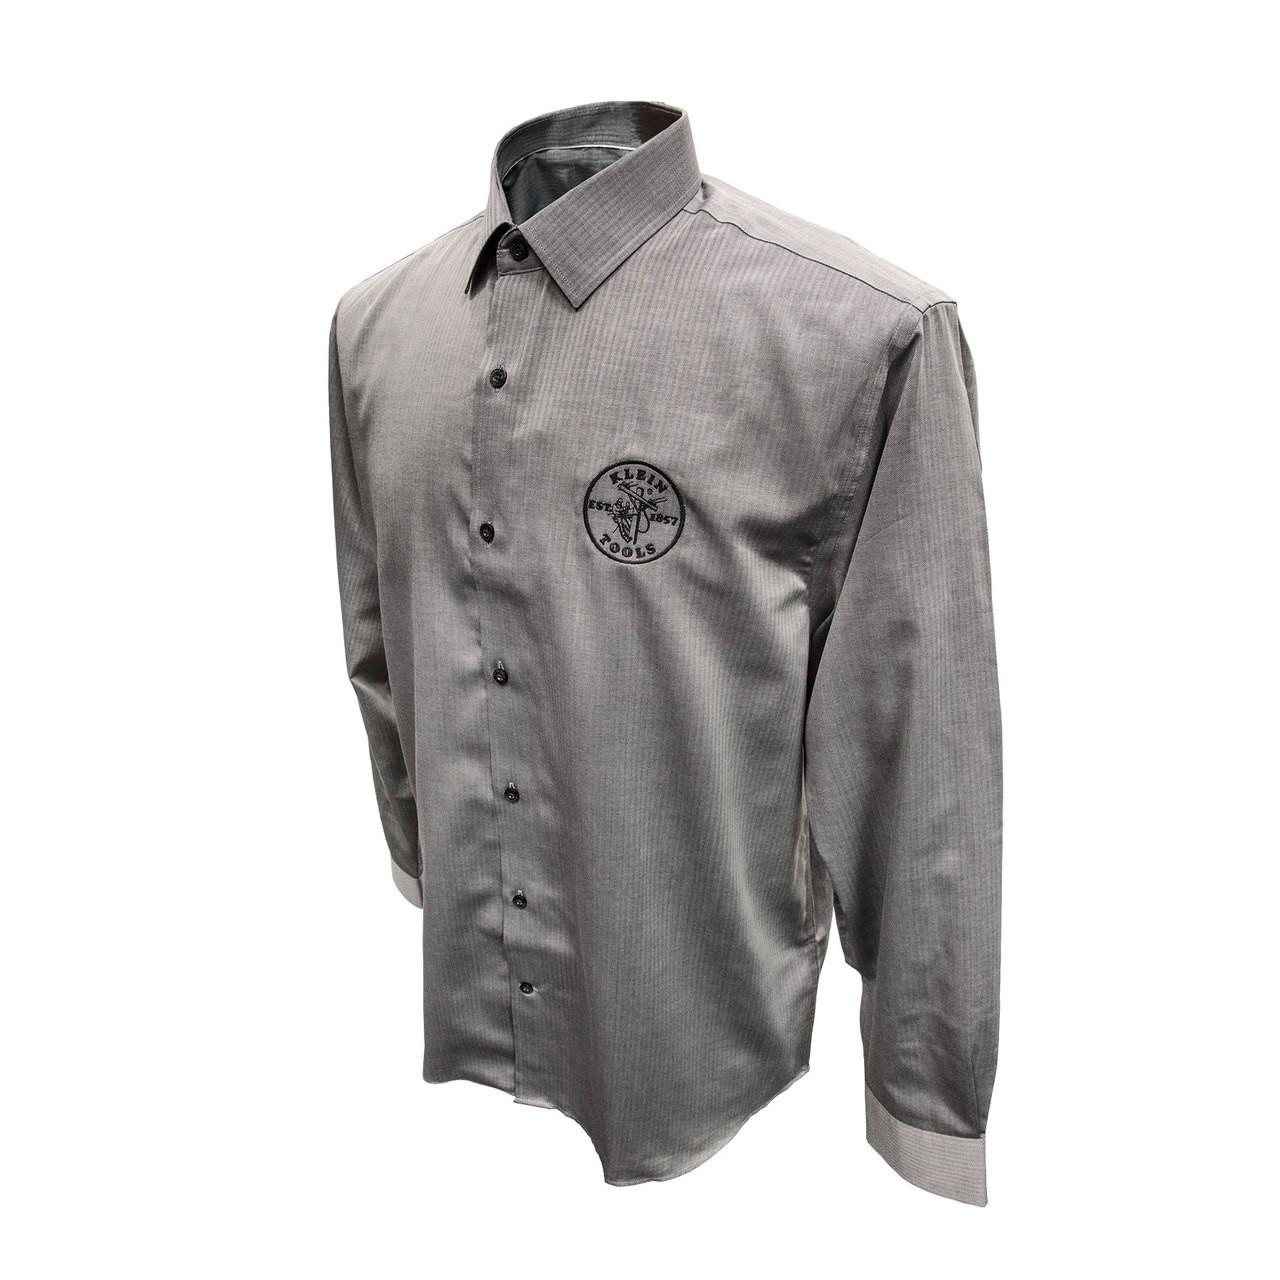 Klein Tools MBA00035-4 Mens Long Sleeve Shirt Gray, XXL - KTOOL